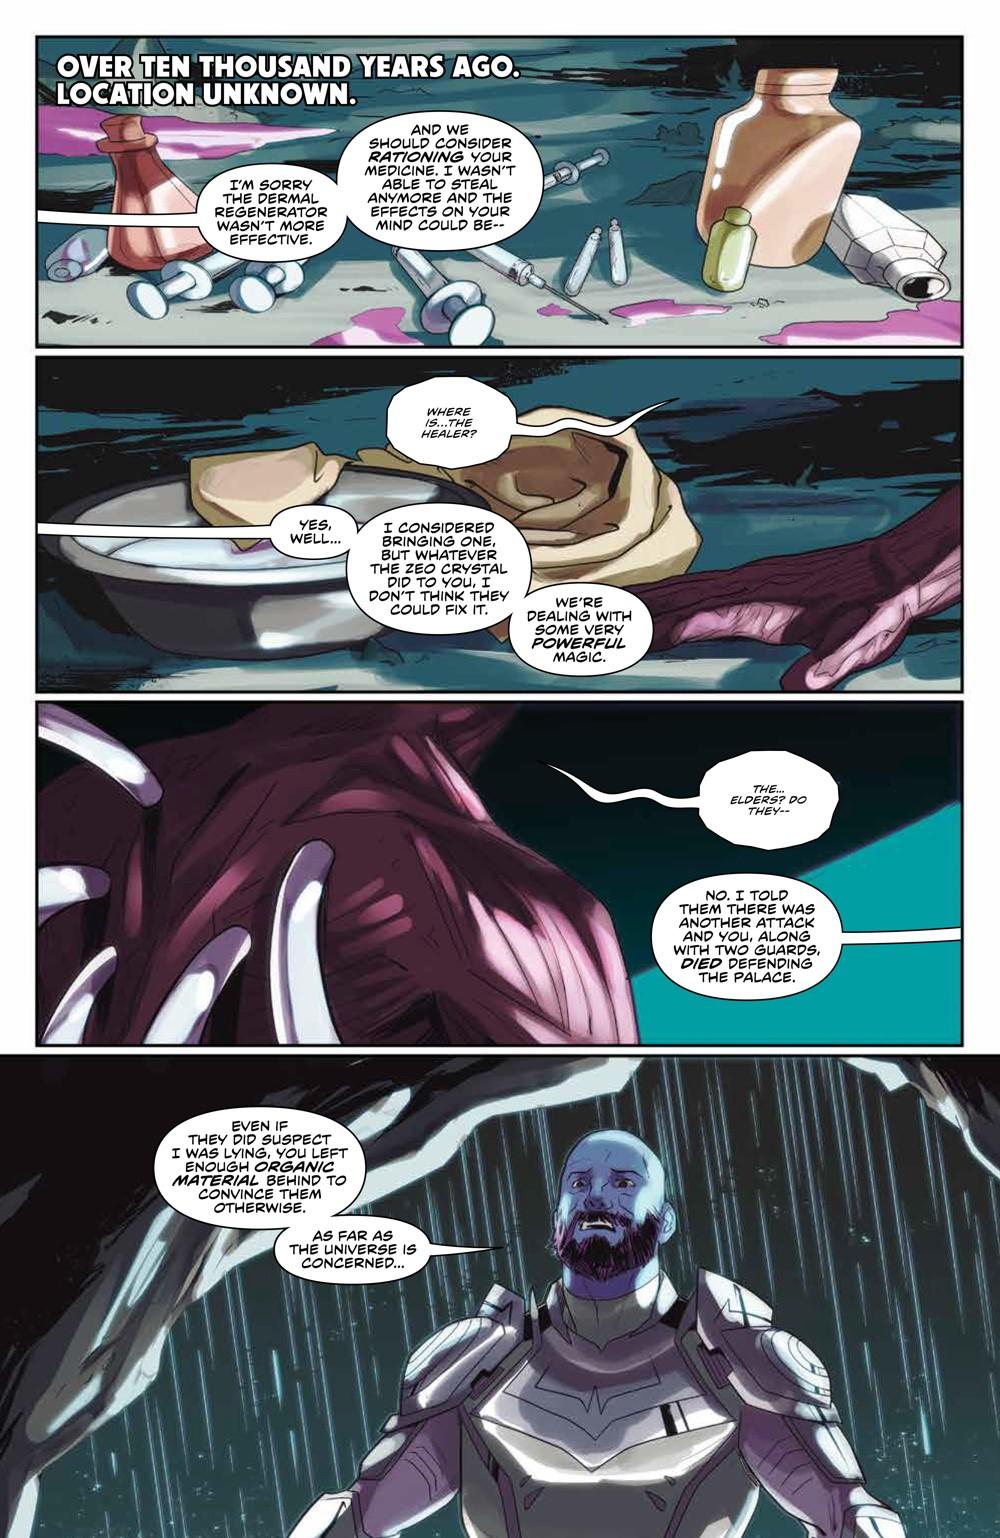 MightyMorphin_011_PRESS_3 ComicList Previews: MIGHTY MORPHIN #11